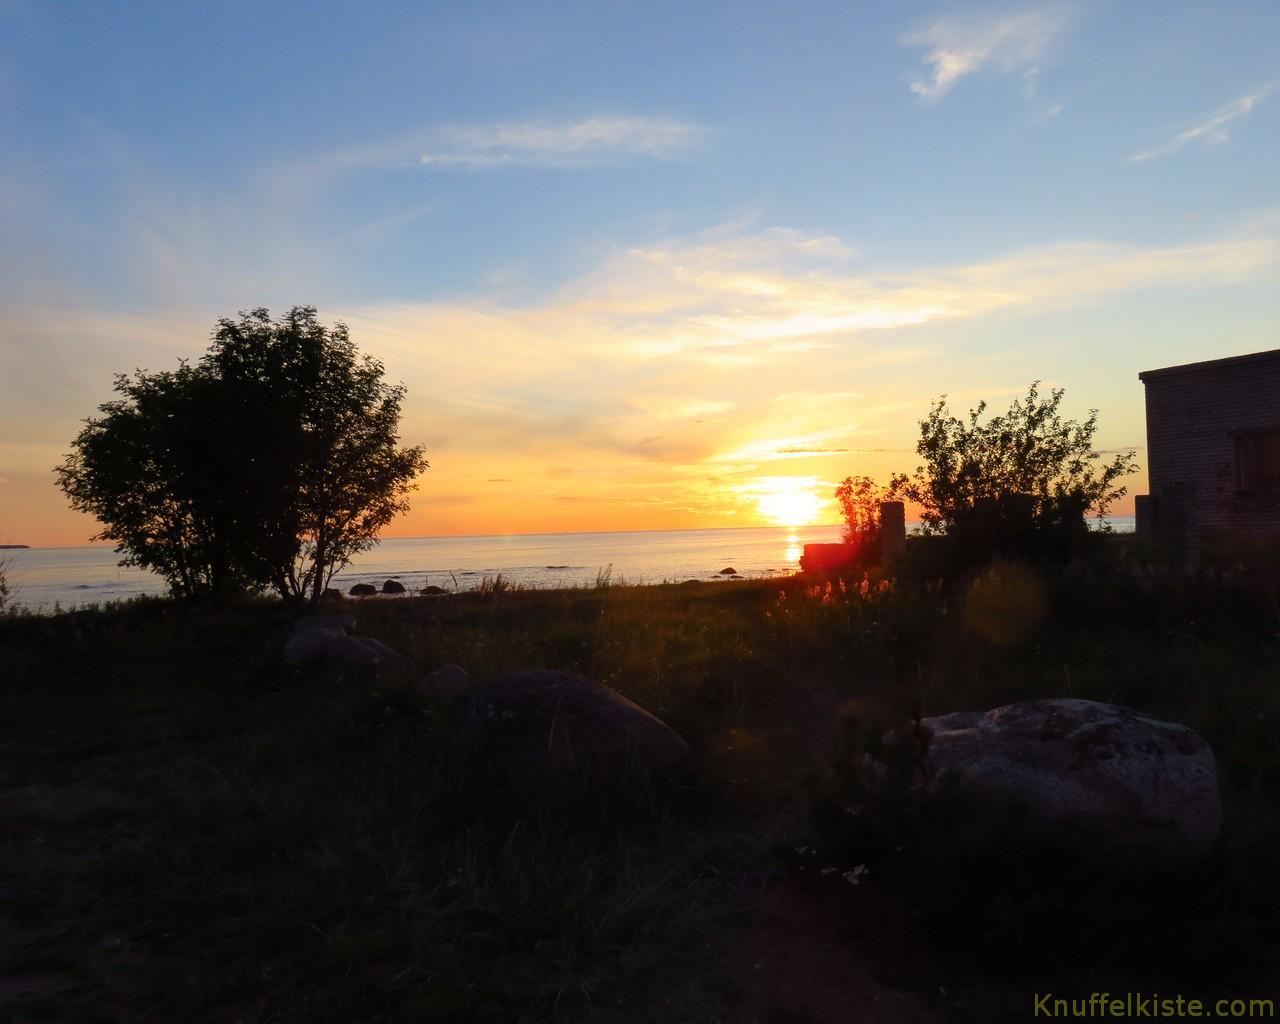 ein paar Sonnenuntergangs Fotos!